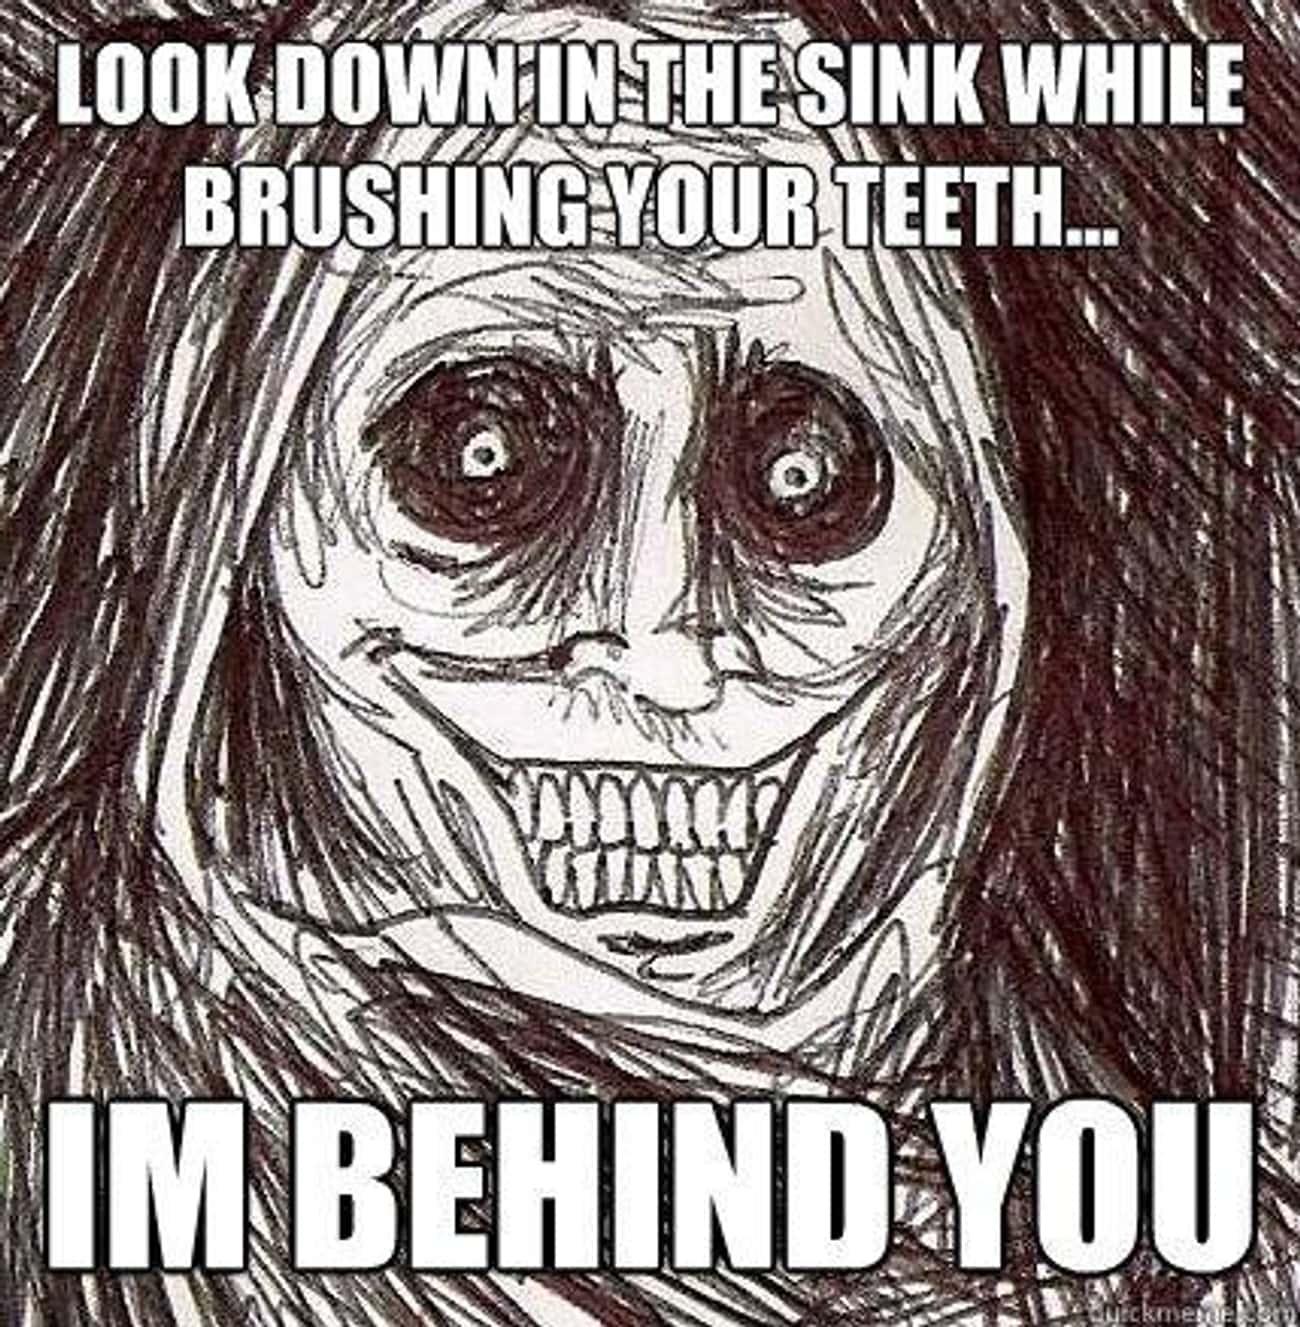 Horrifying Houseguest on Bathroom Time